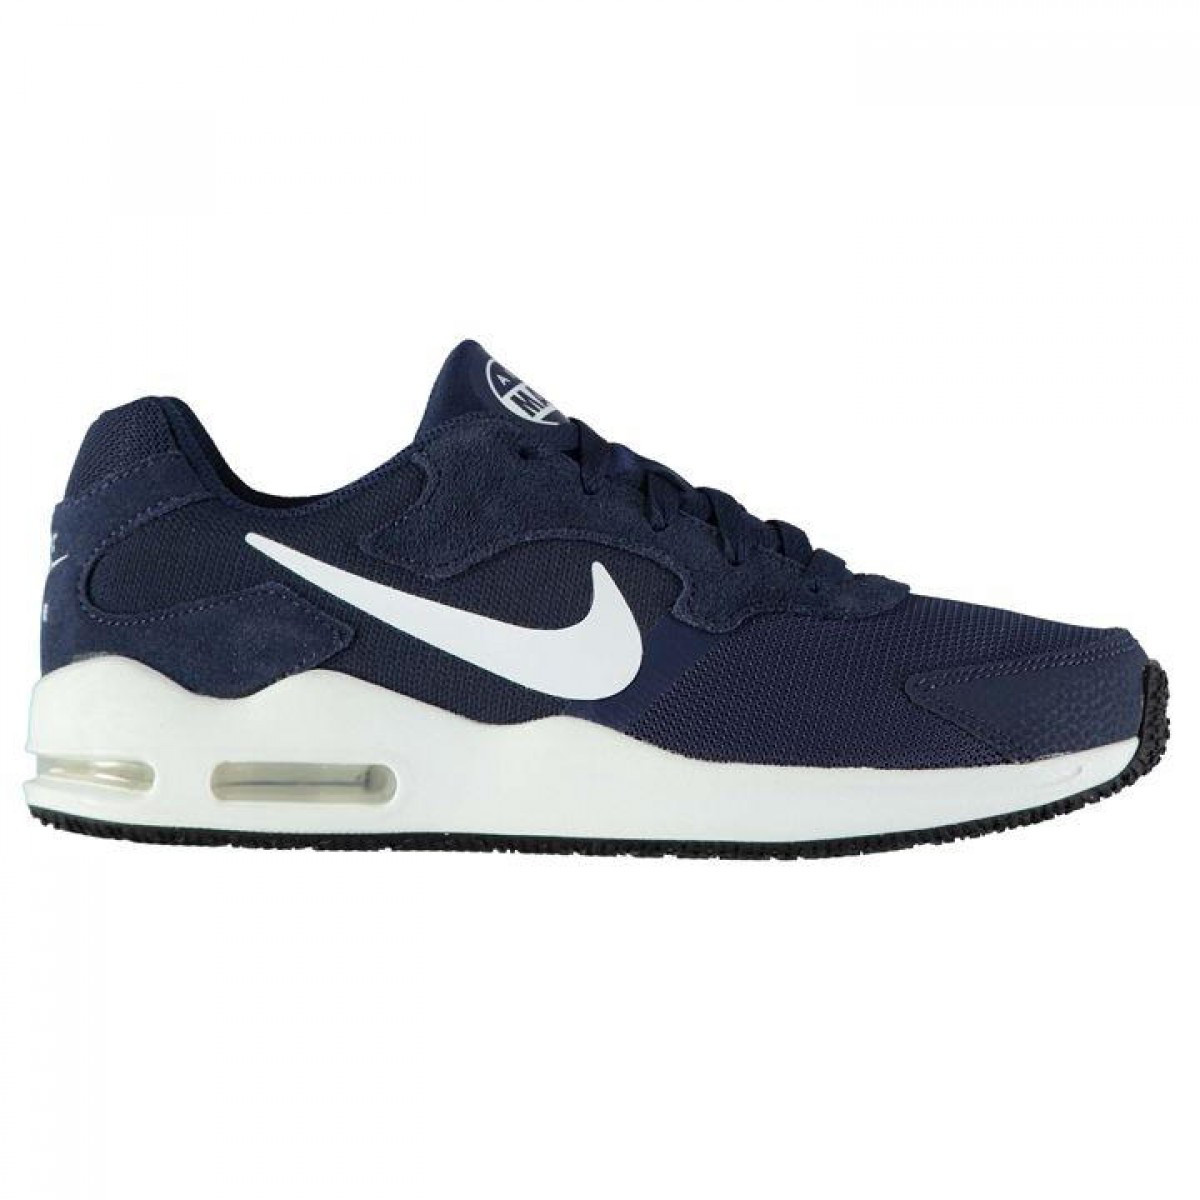 834d498f Кроссовки Nike Air Max Guile Navy/White - Оригинал - FAIR - оригинальная  одежда и